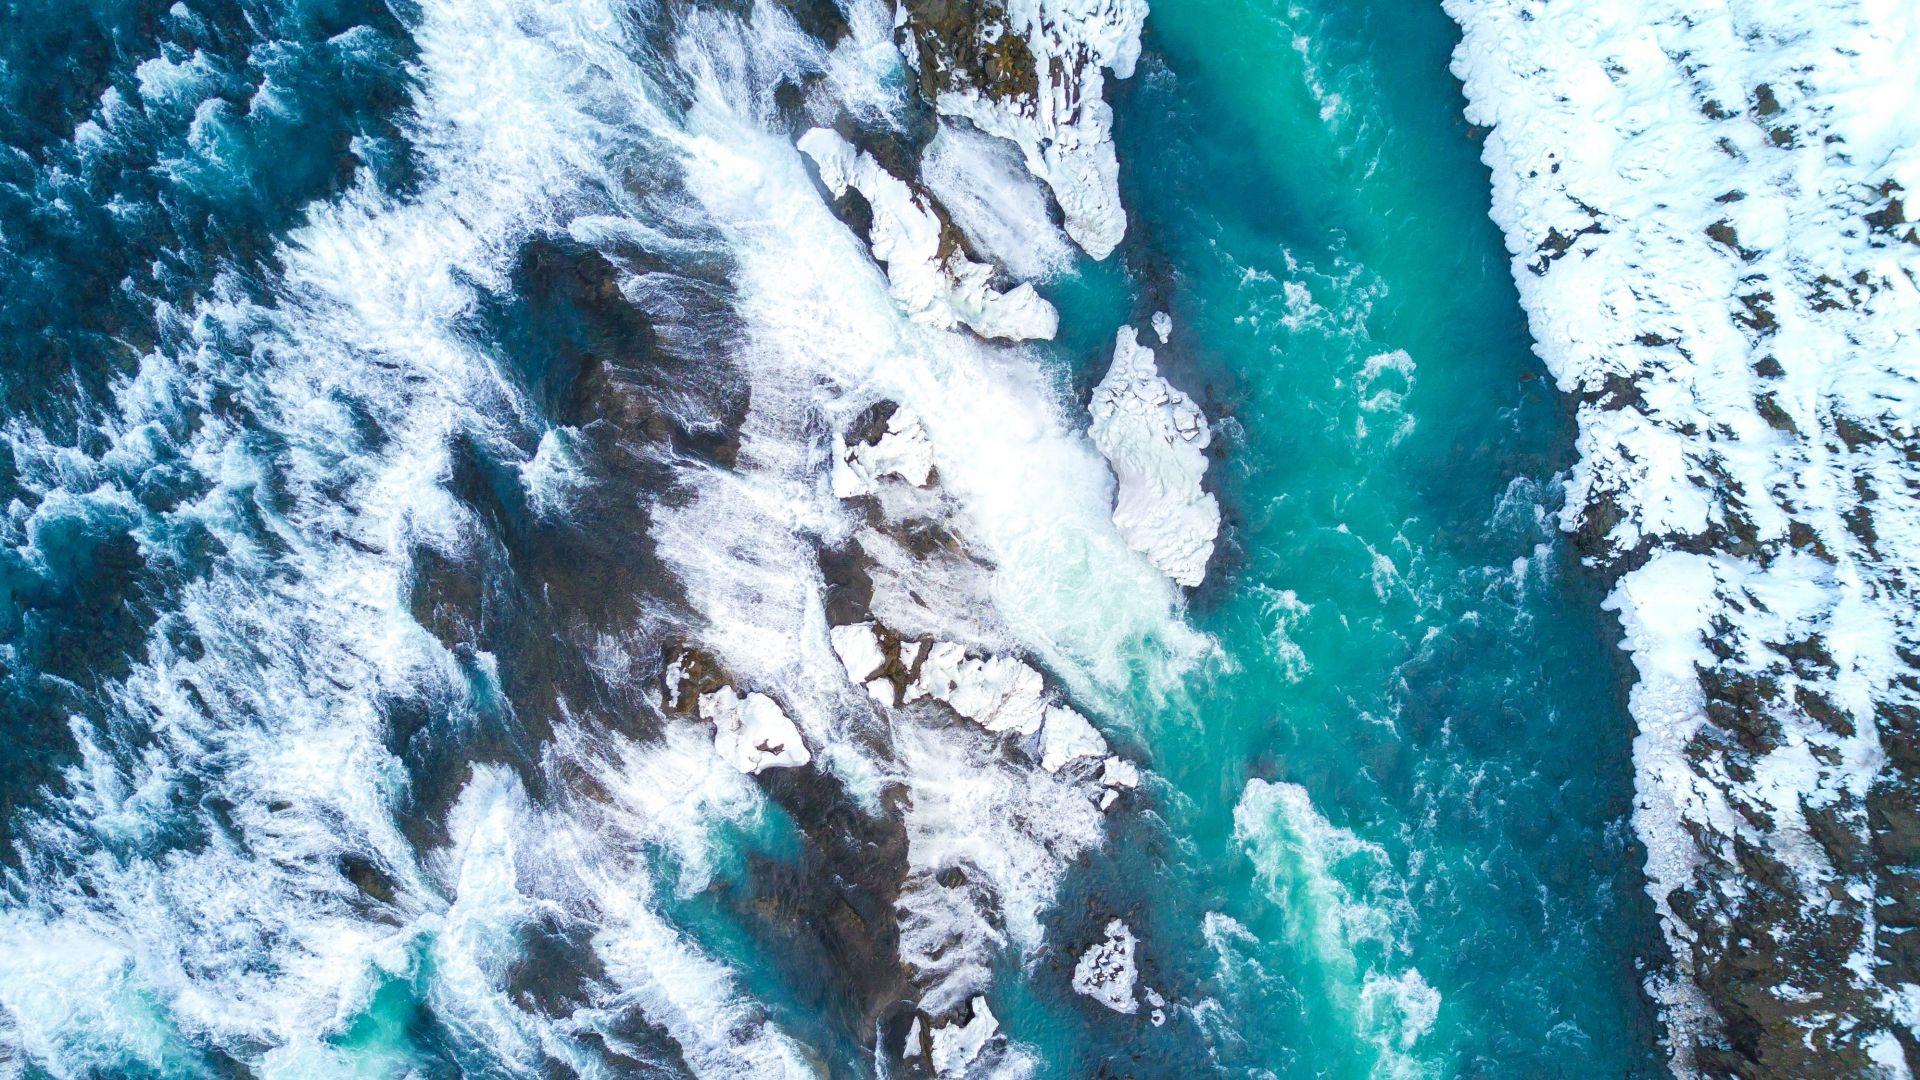 Wallpaper Gullfoss, waterfalls, iceland, river, aerial view, 4k